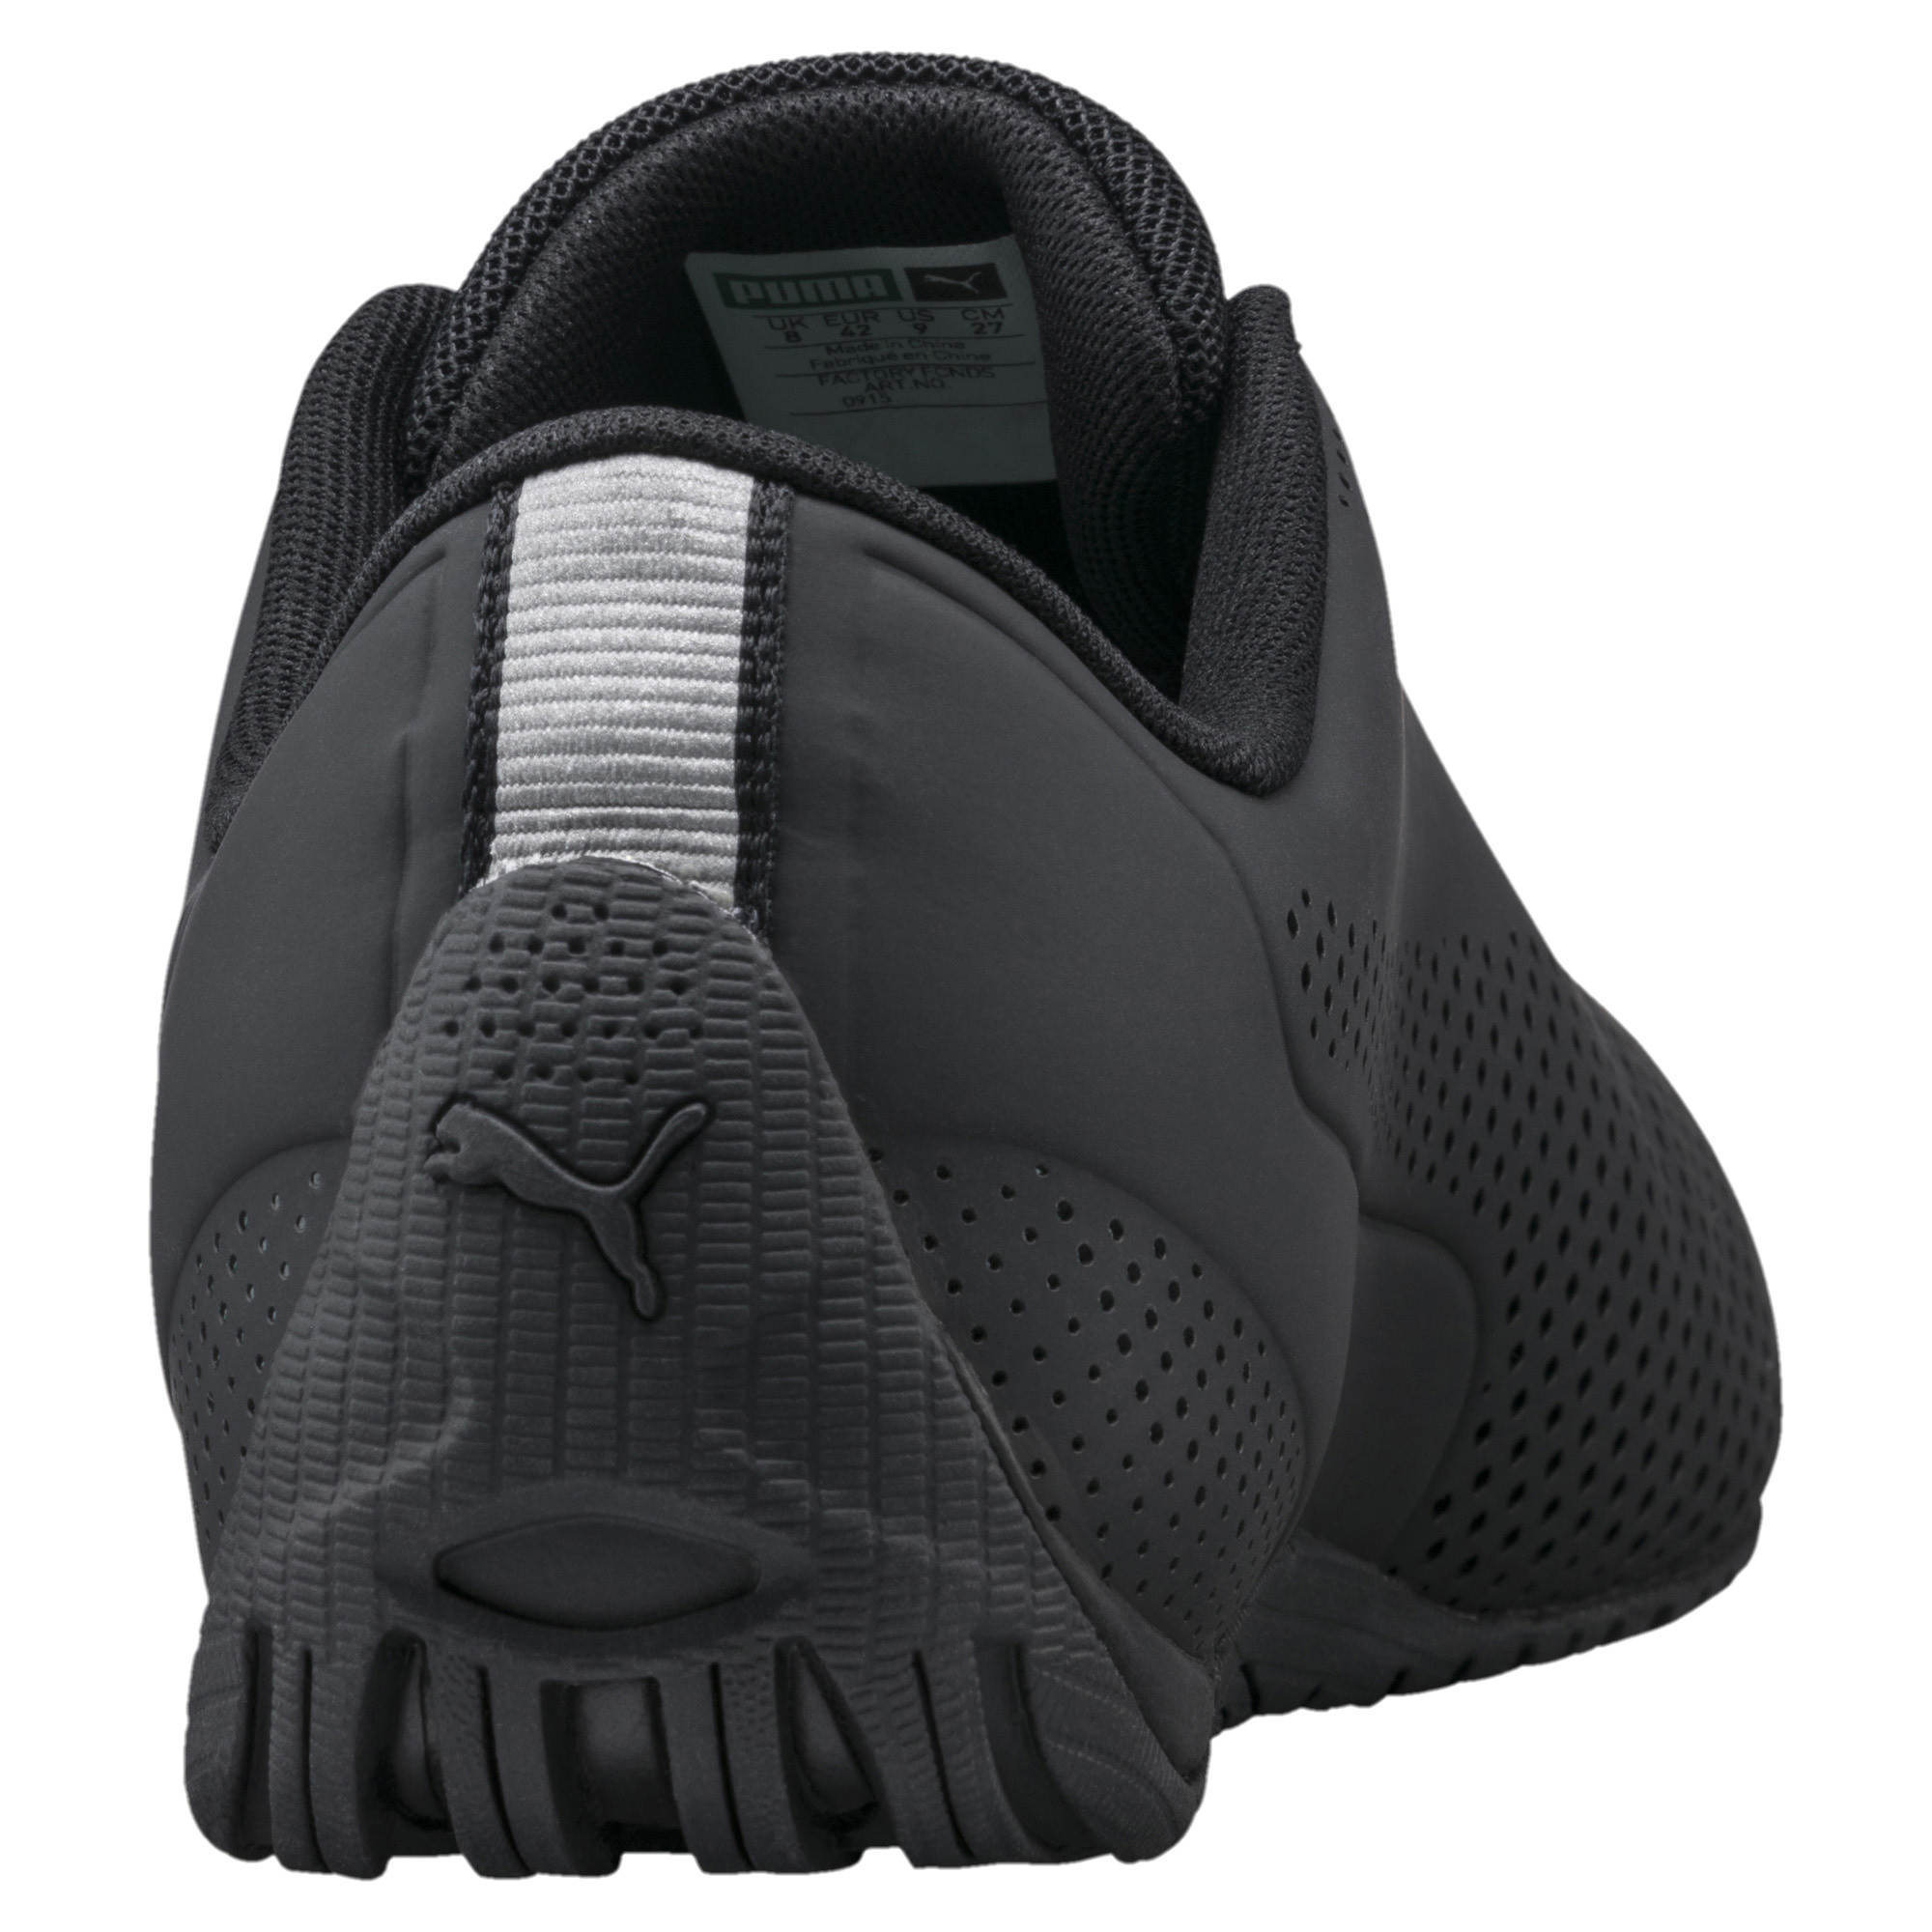 PUMA-Men-039-s-Drift-Cat-Ultra-Reflective-Shoes thumbnail 3